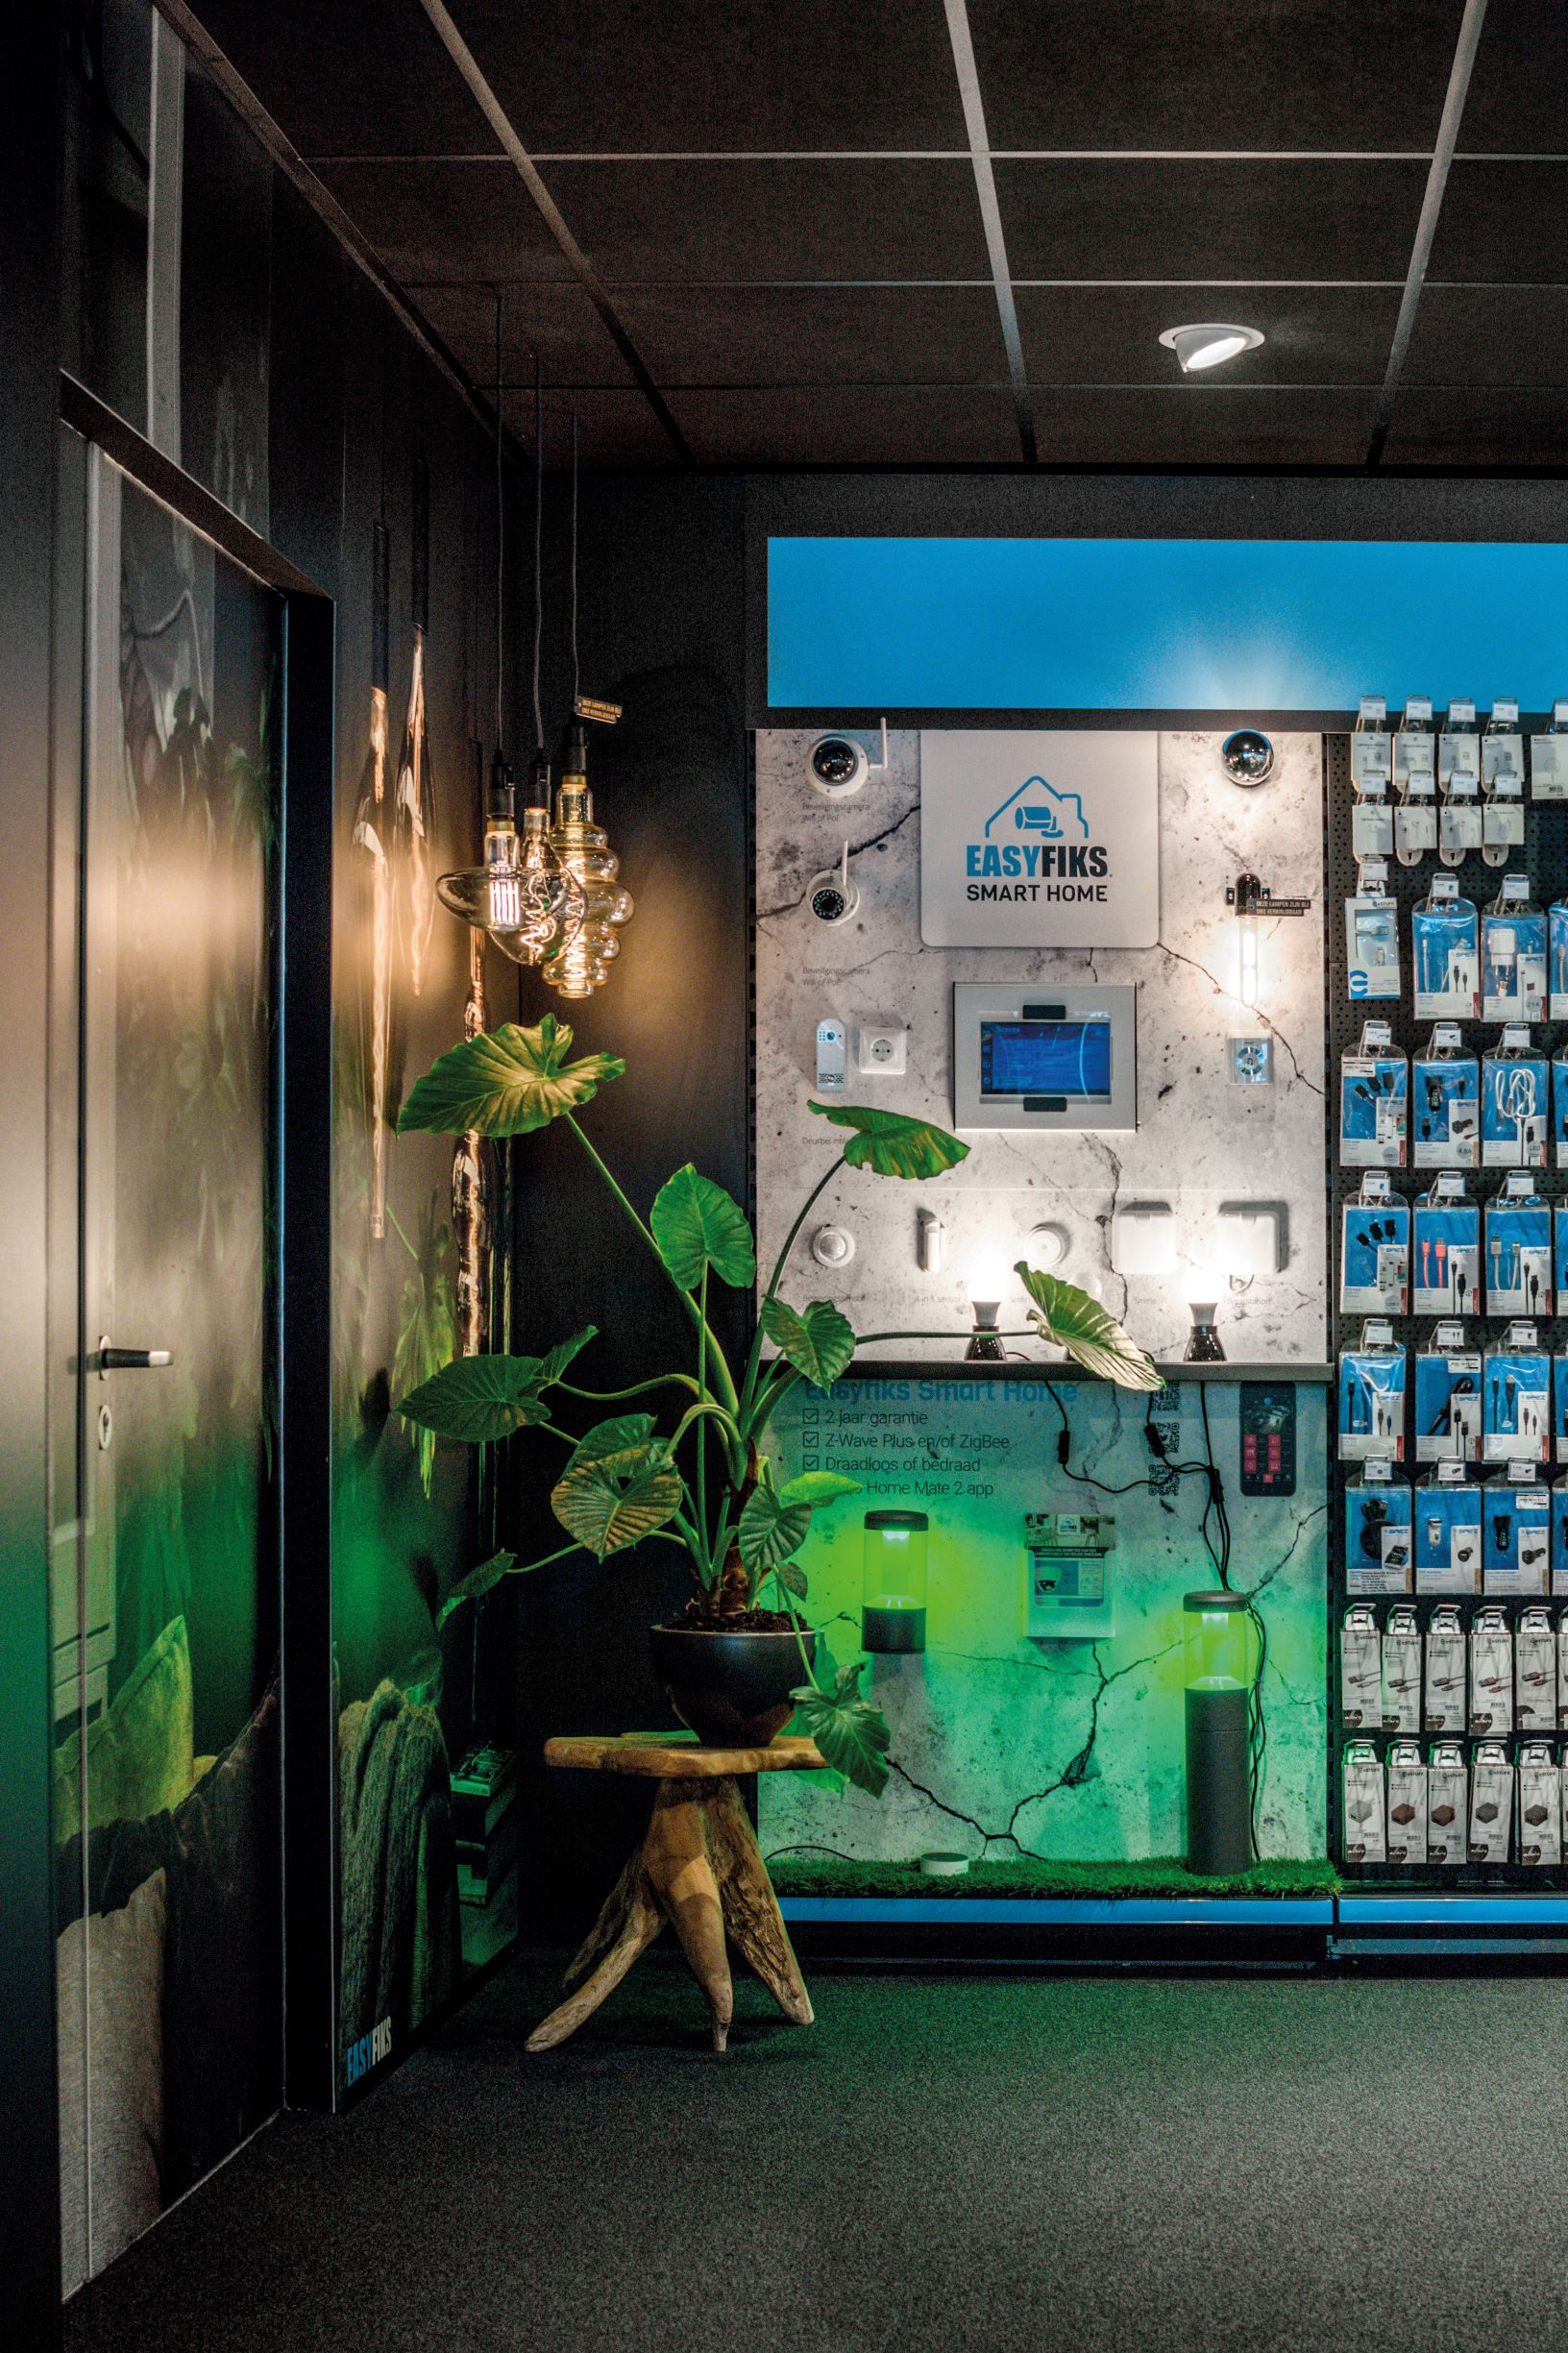 Easyfiks smart home winkel presentatie